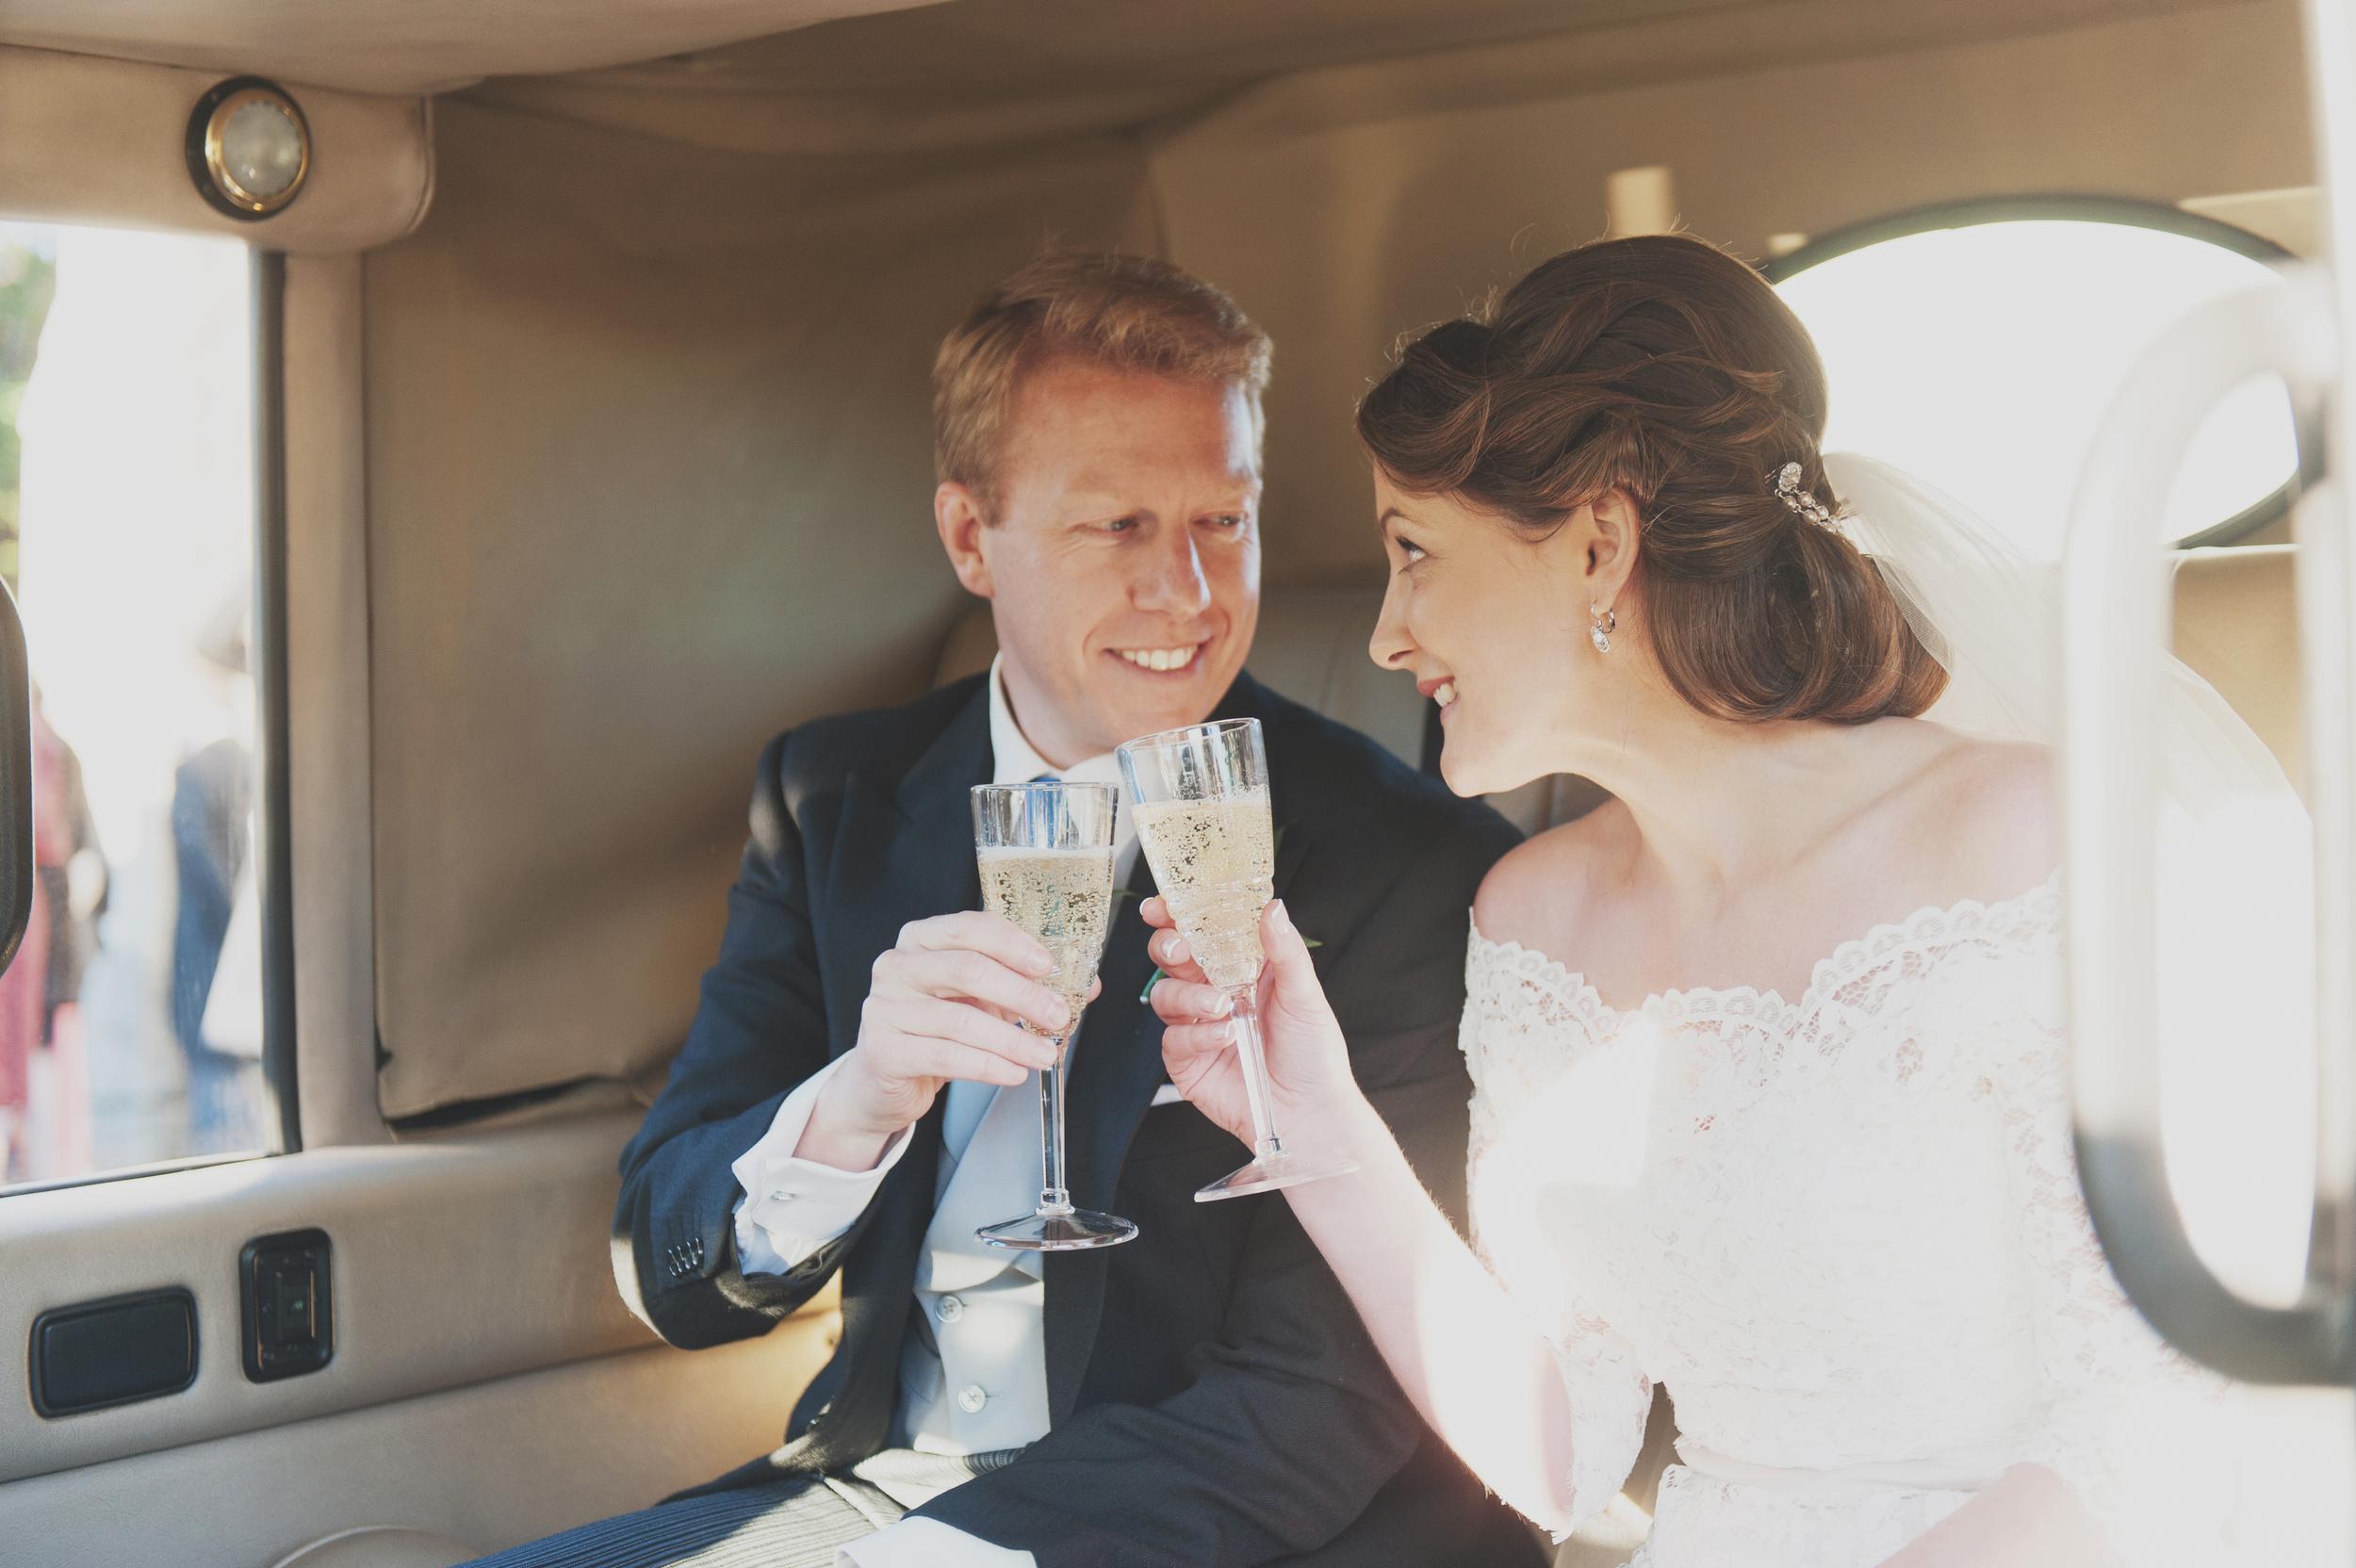 Carton_House_Wedding_Photography_Maynooth_Ireland_056.jpg